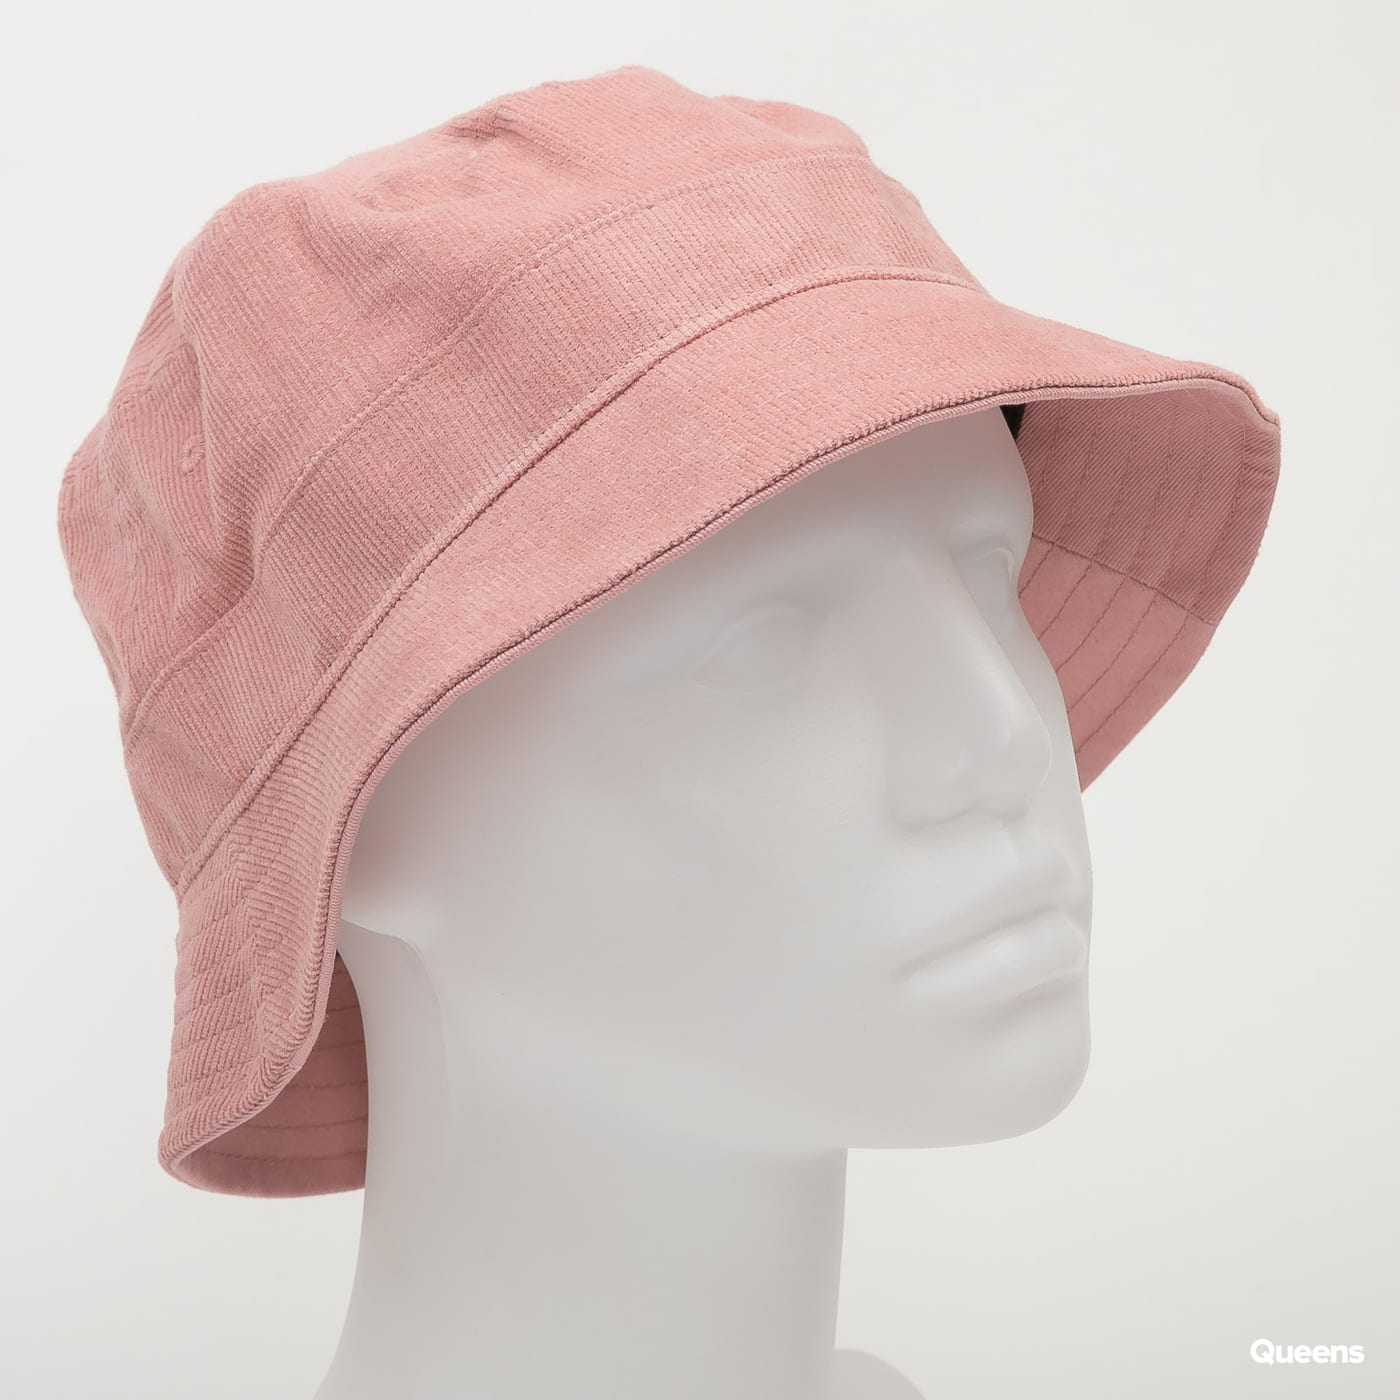 New Era WMNS Pastel Cord pink